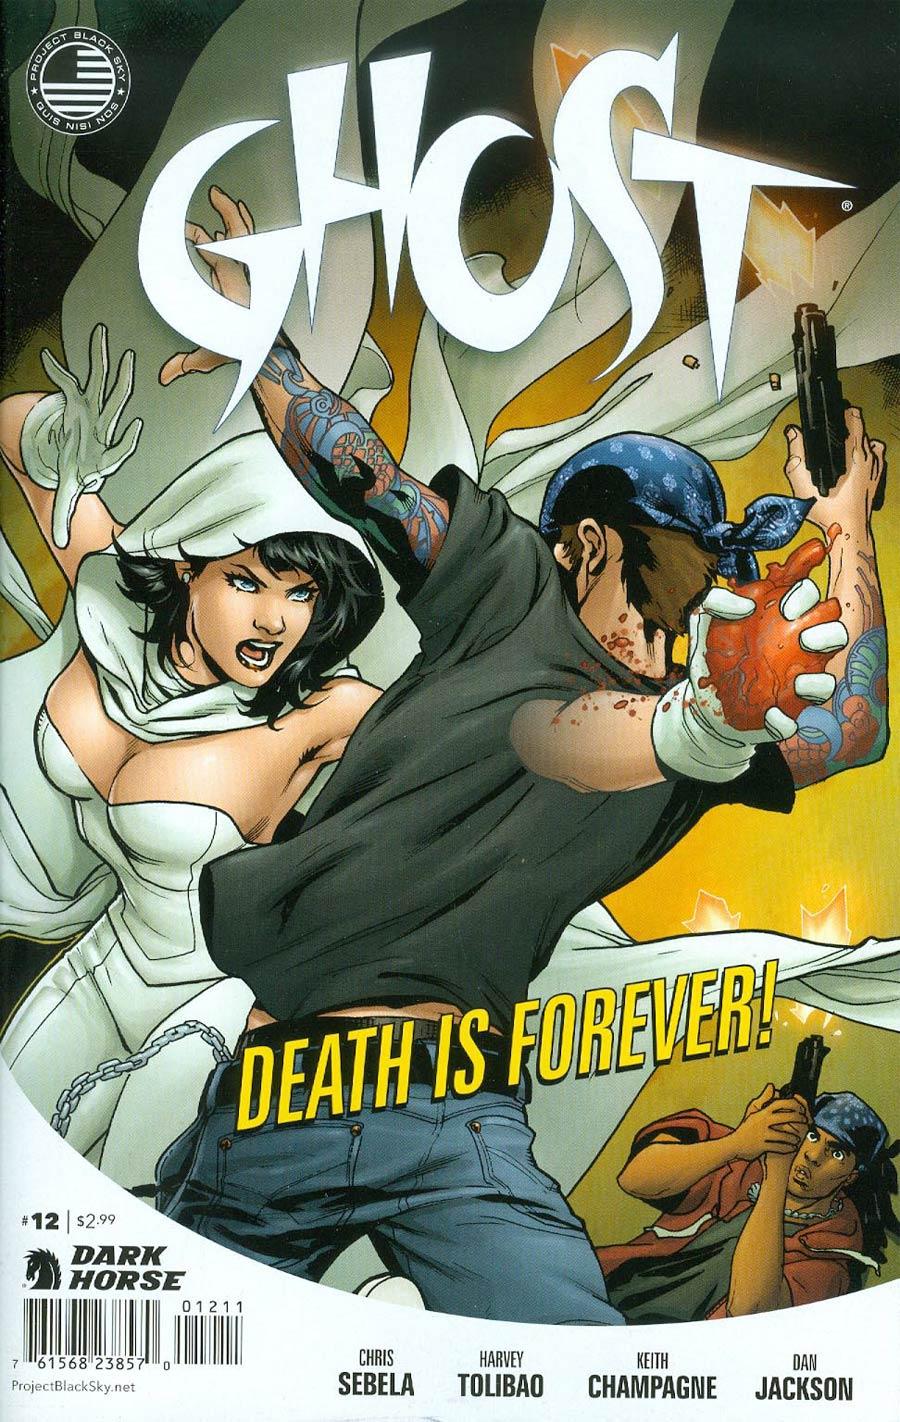 Ghost Vol 4 #12